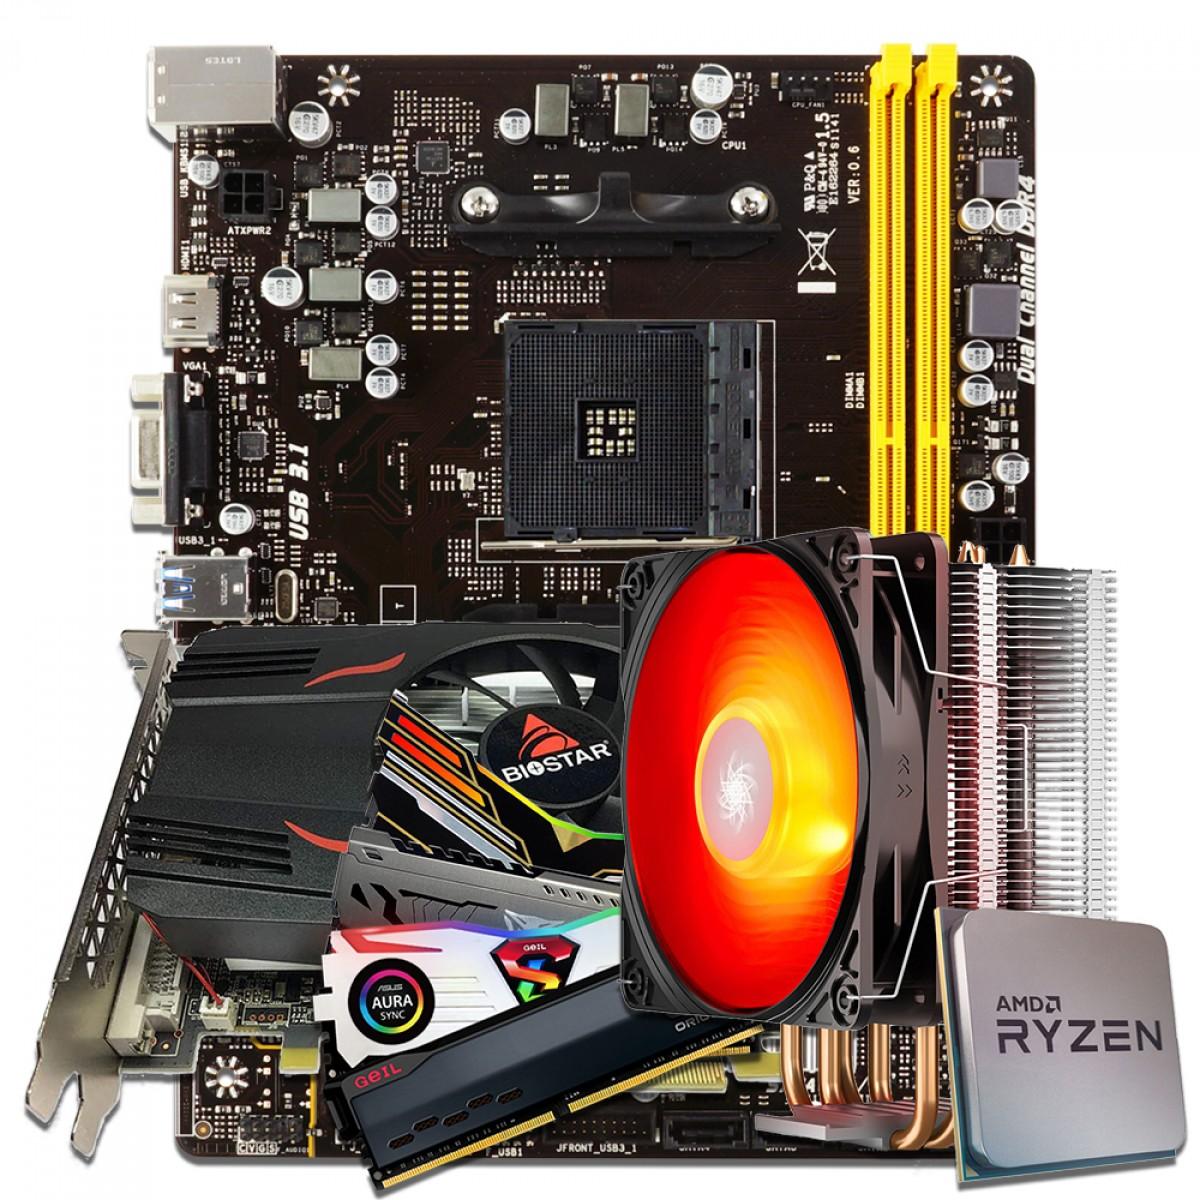 Kit Upgrade Biostar Radeon Rx 550 4GB + Ryzen 3 3300x + Biostar A320MH + Memória DDR4 16GB (2x8GB) 3000MHz + Cooler de Brinde